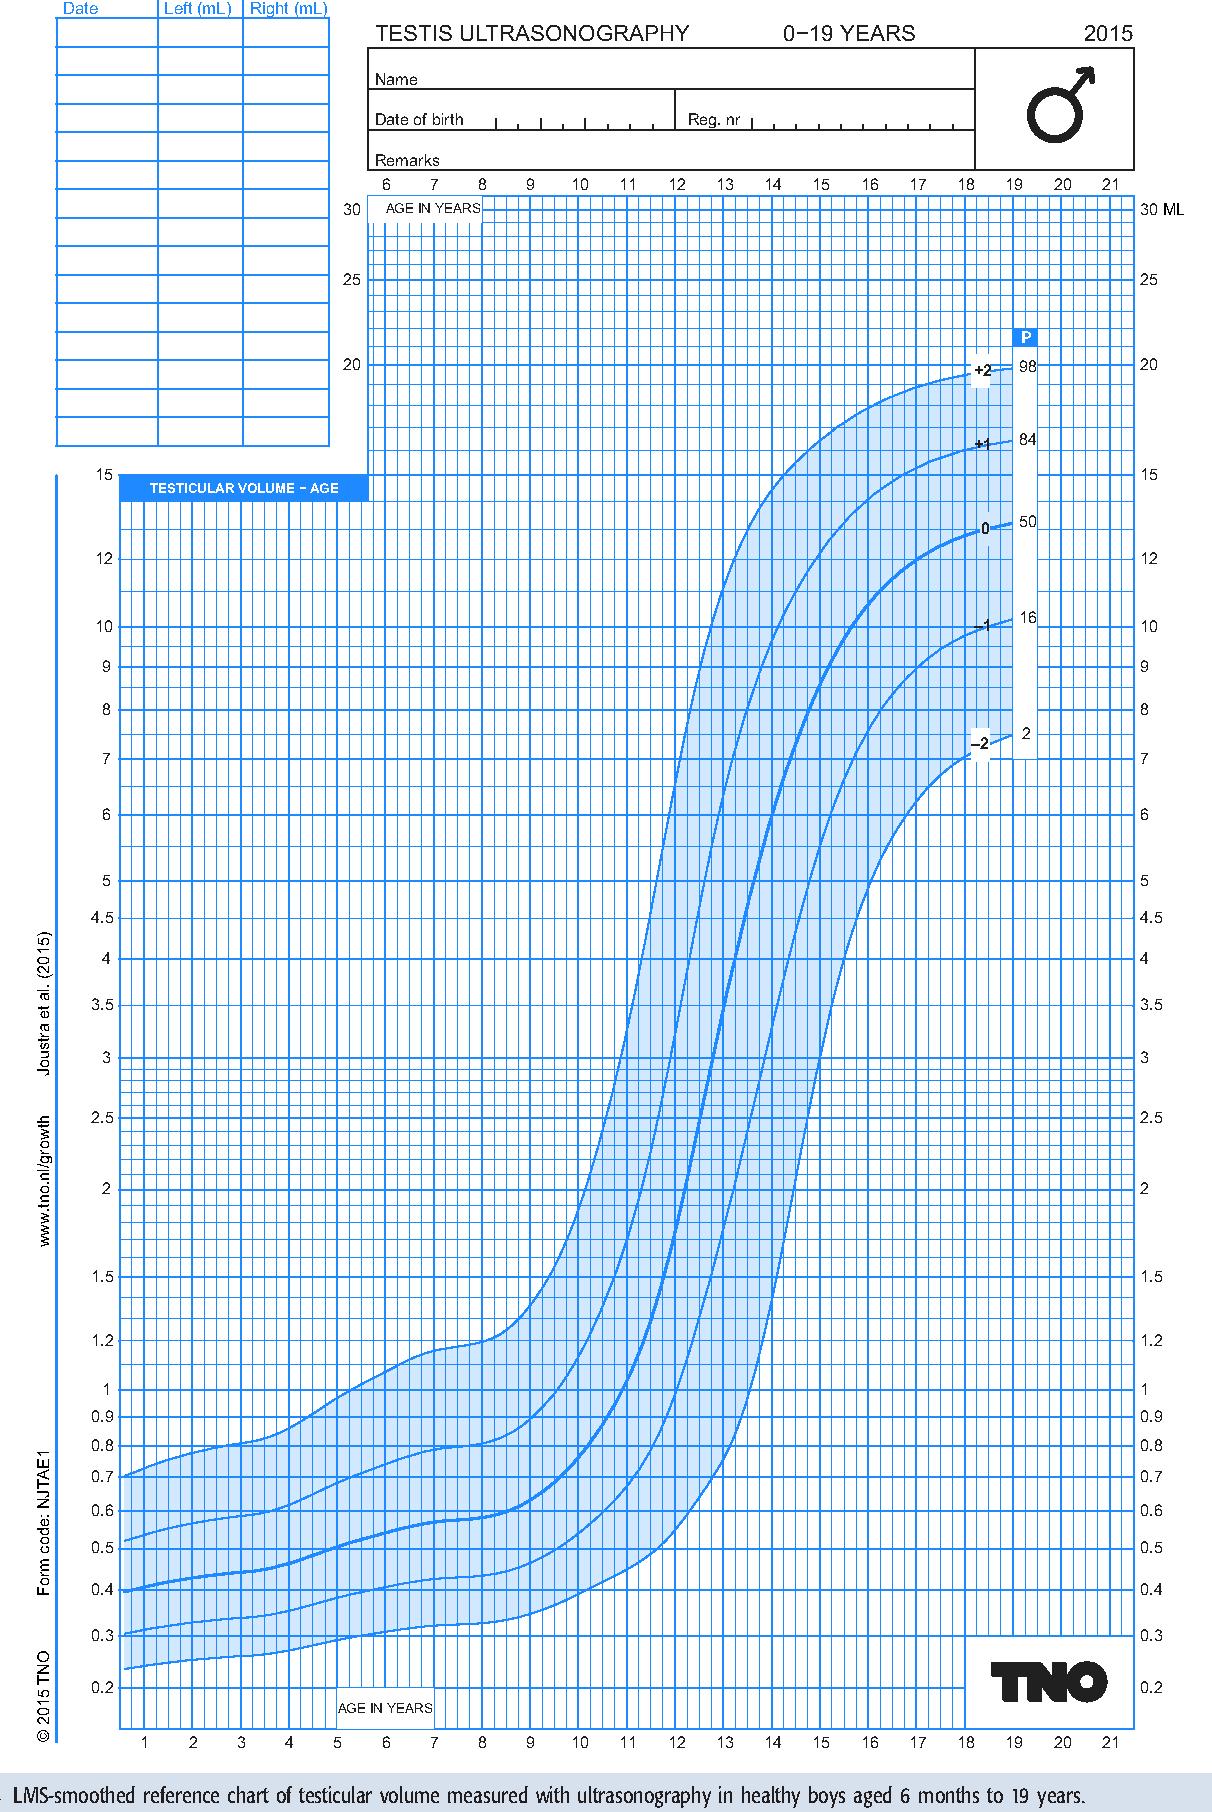 3 yr old growth chart choice image free any chart examples wolf hirschhorn growth chart choice image free any chart examples growth chart 4 year old boy nvjuhfo Images